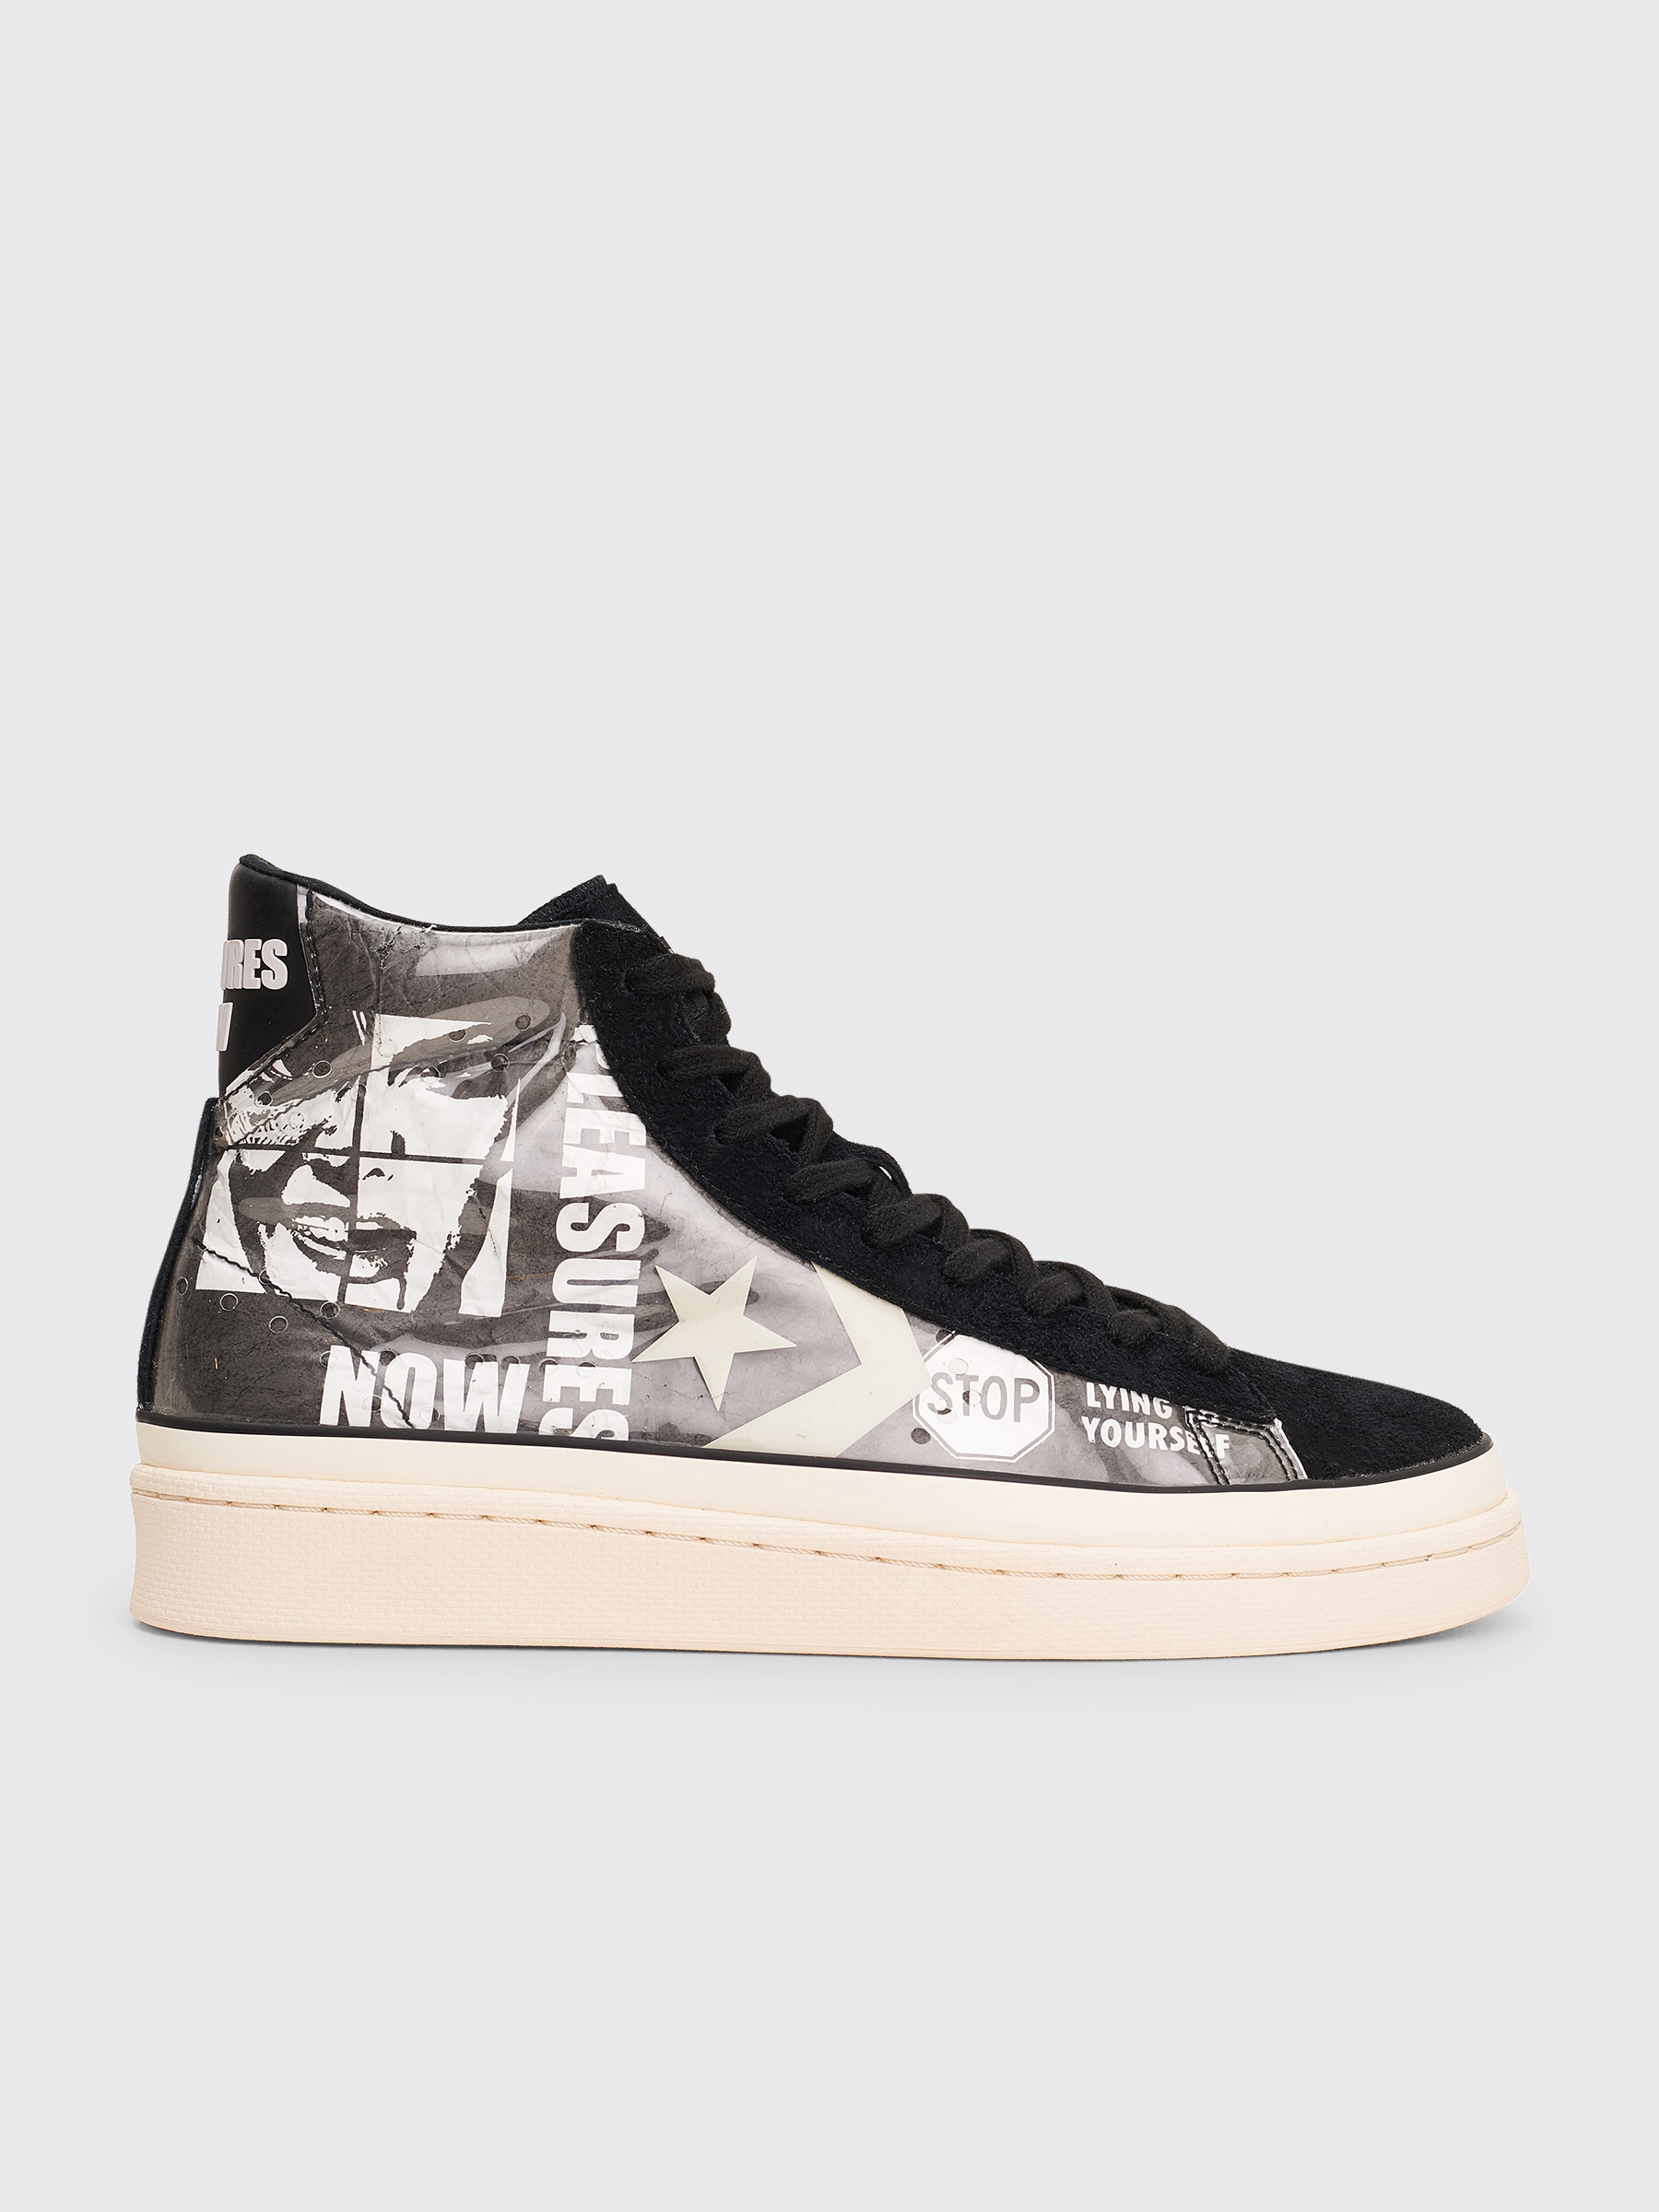 Converse x Pleasures Pro Leather Mid Black White